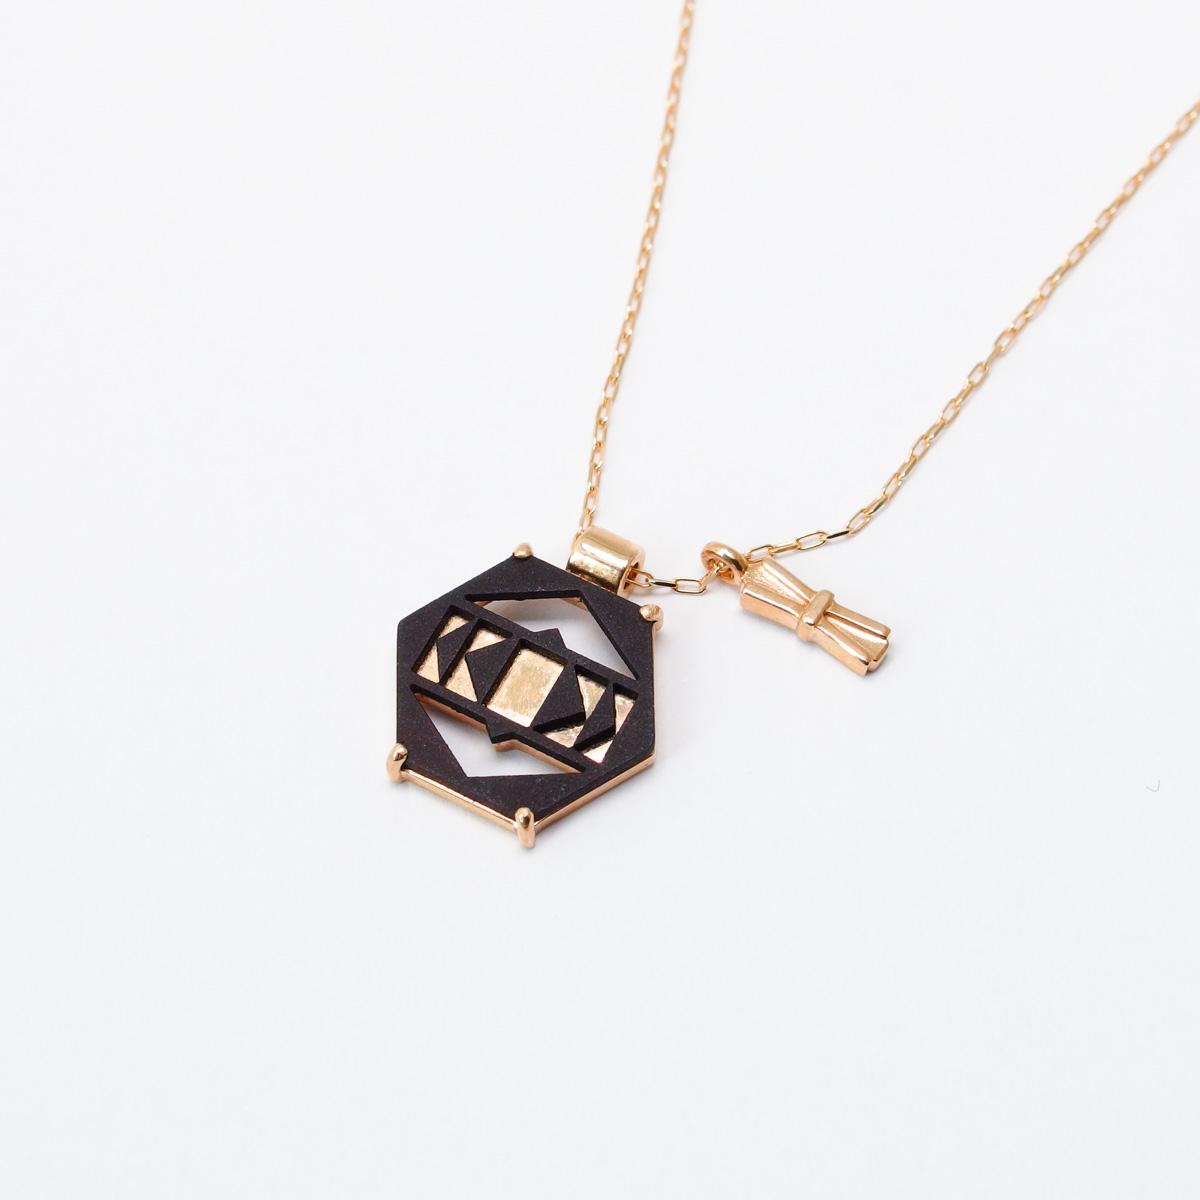 K10×鉄 ヘキサゴンネックレス